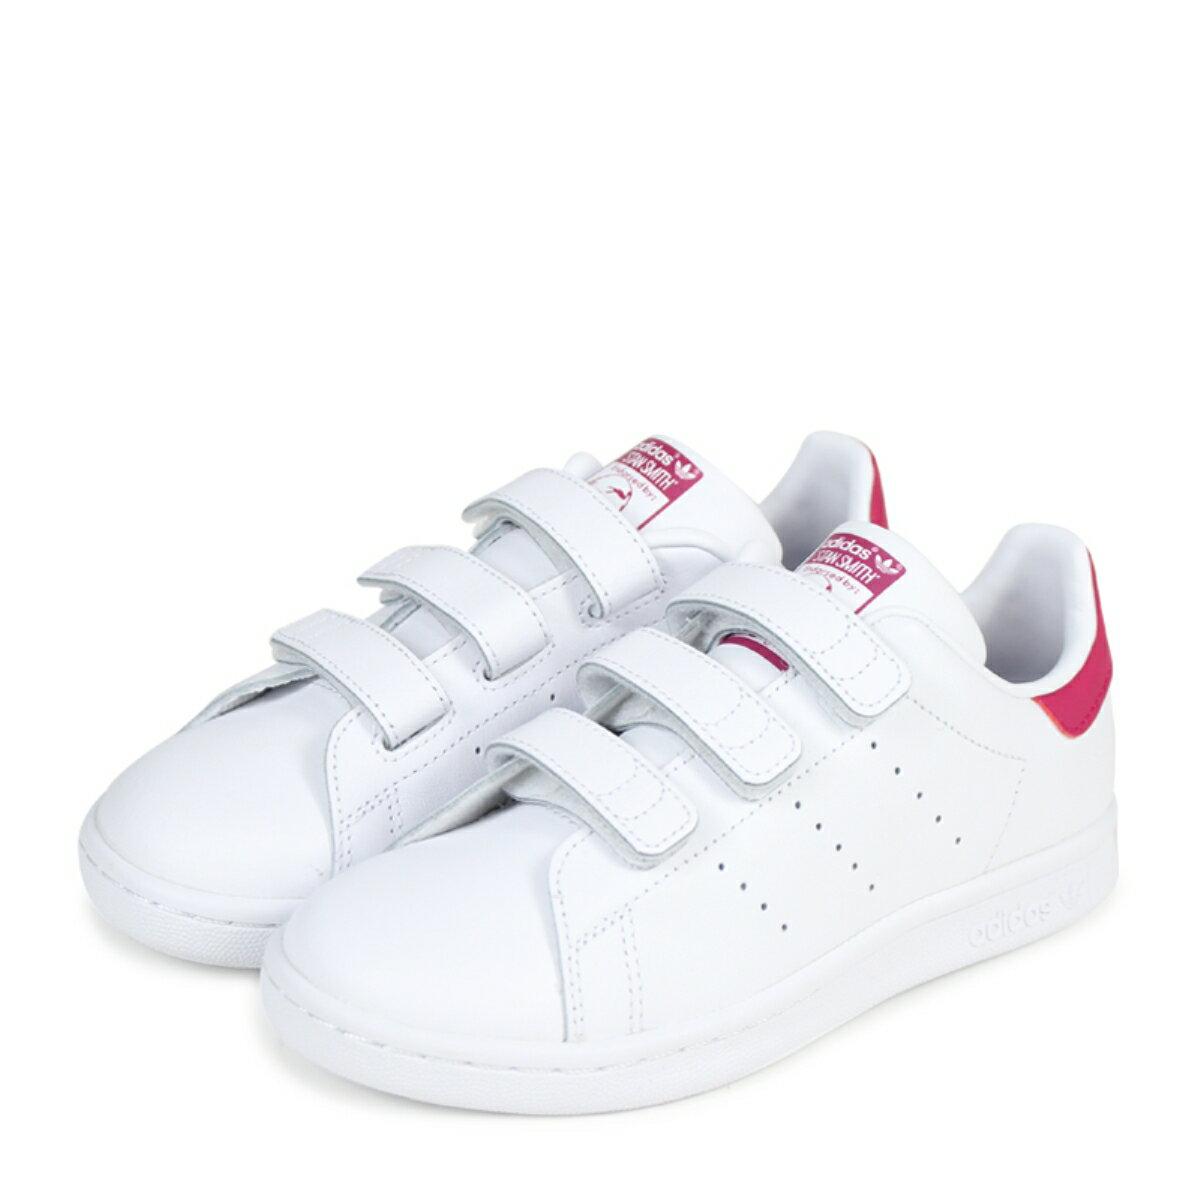 adidas Originals STAN SMITH CF C スタンスミス キッズ アディダス オリジナルス スニーカー B32706 靴 ホワイト [184]